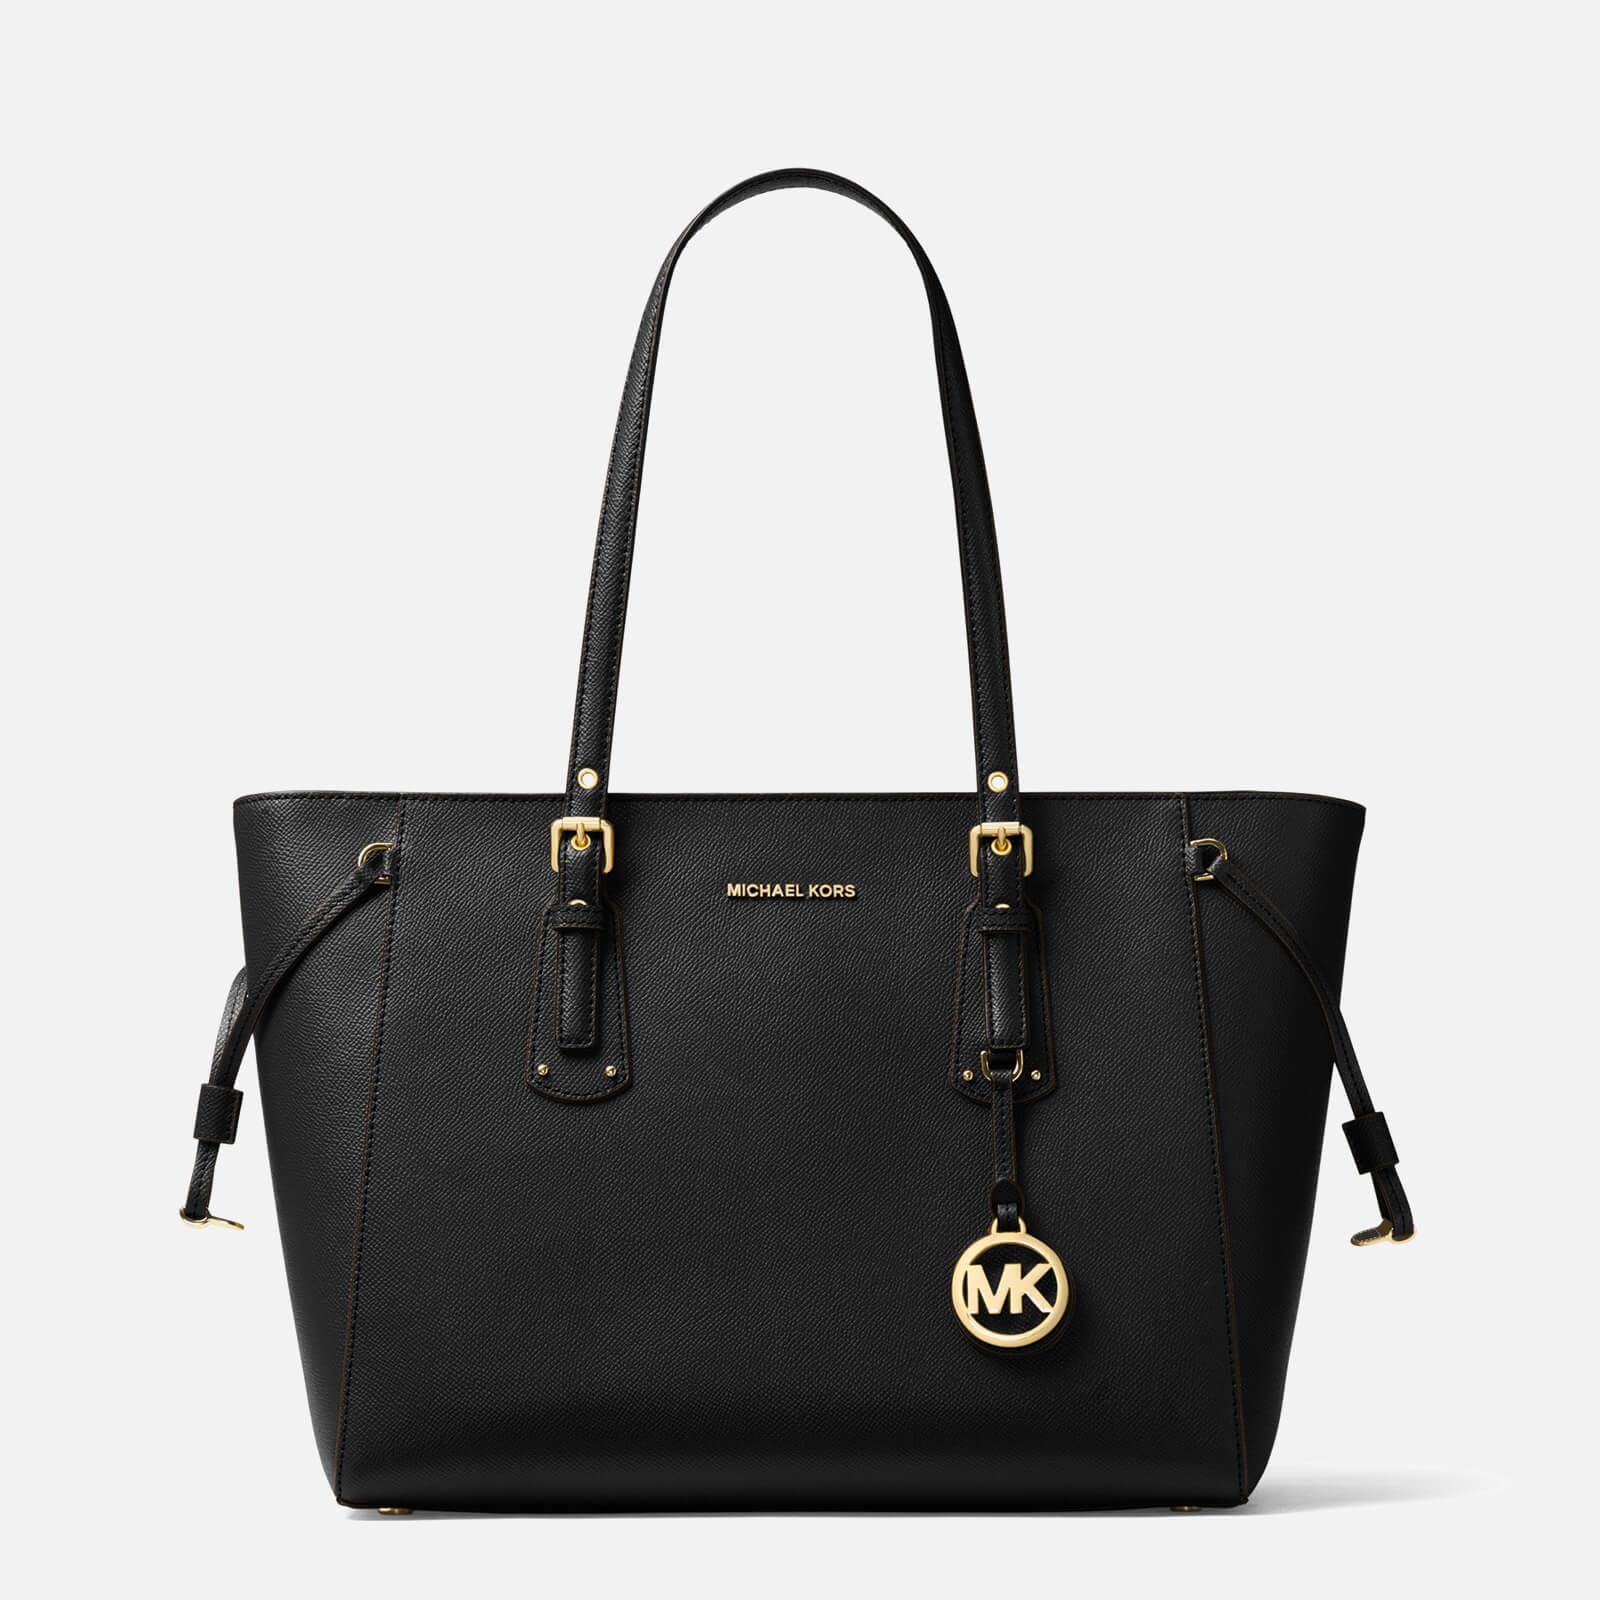 Michael Michael Kors Women's Voyager Tote Bag - Black